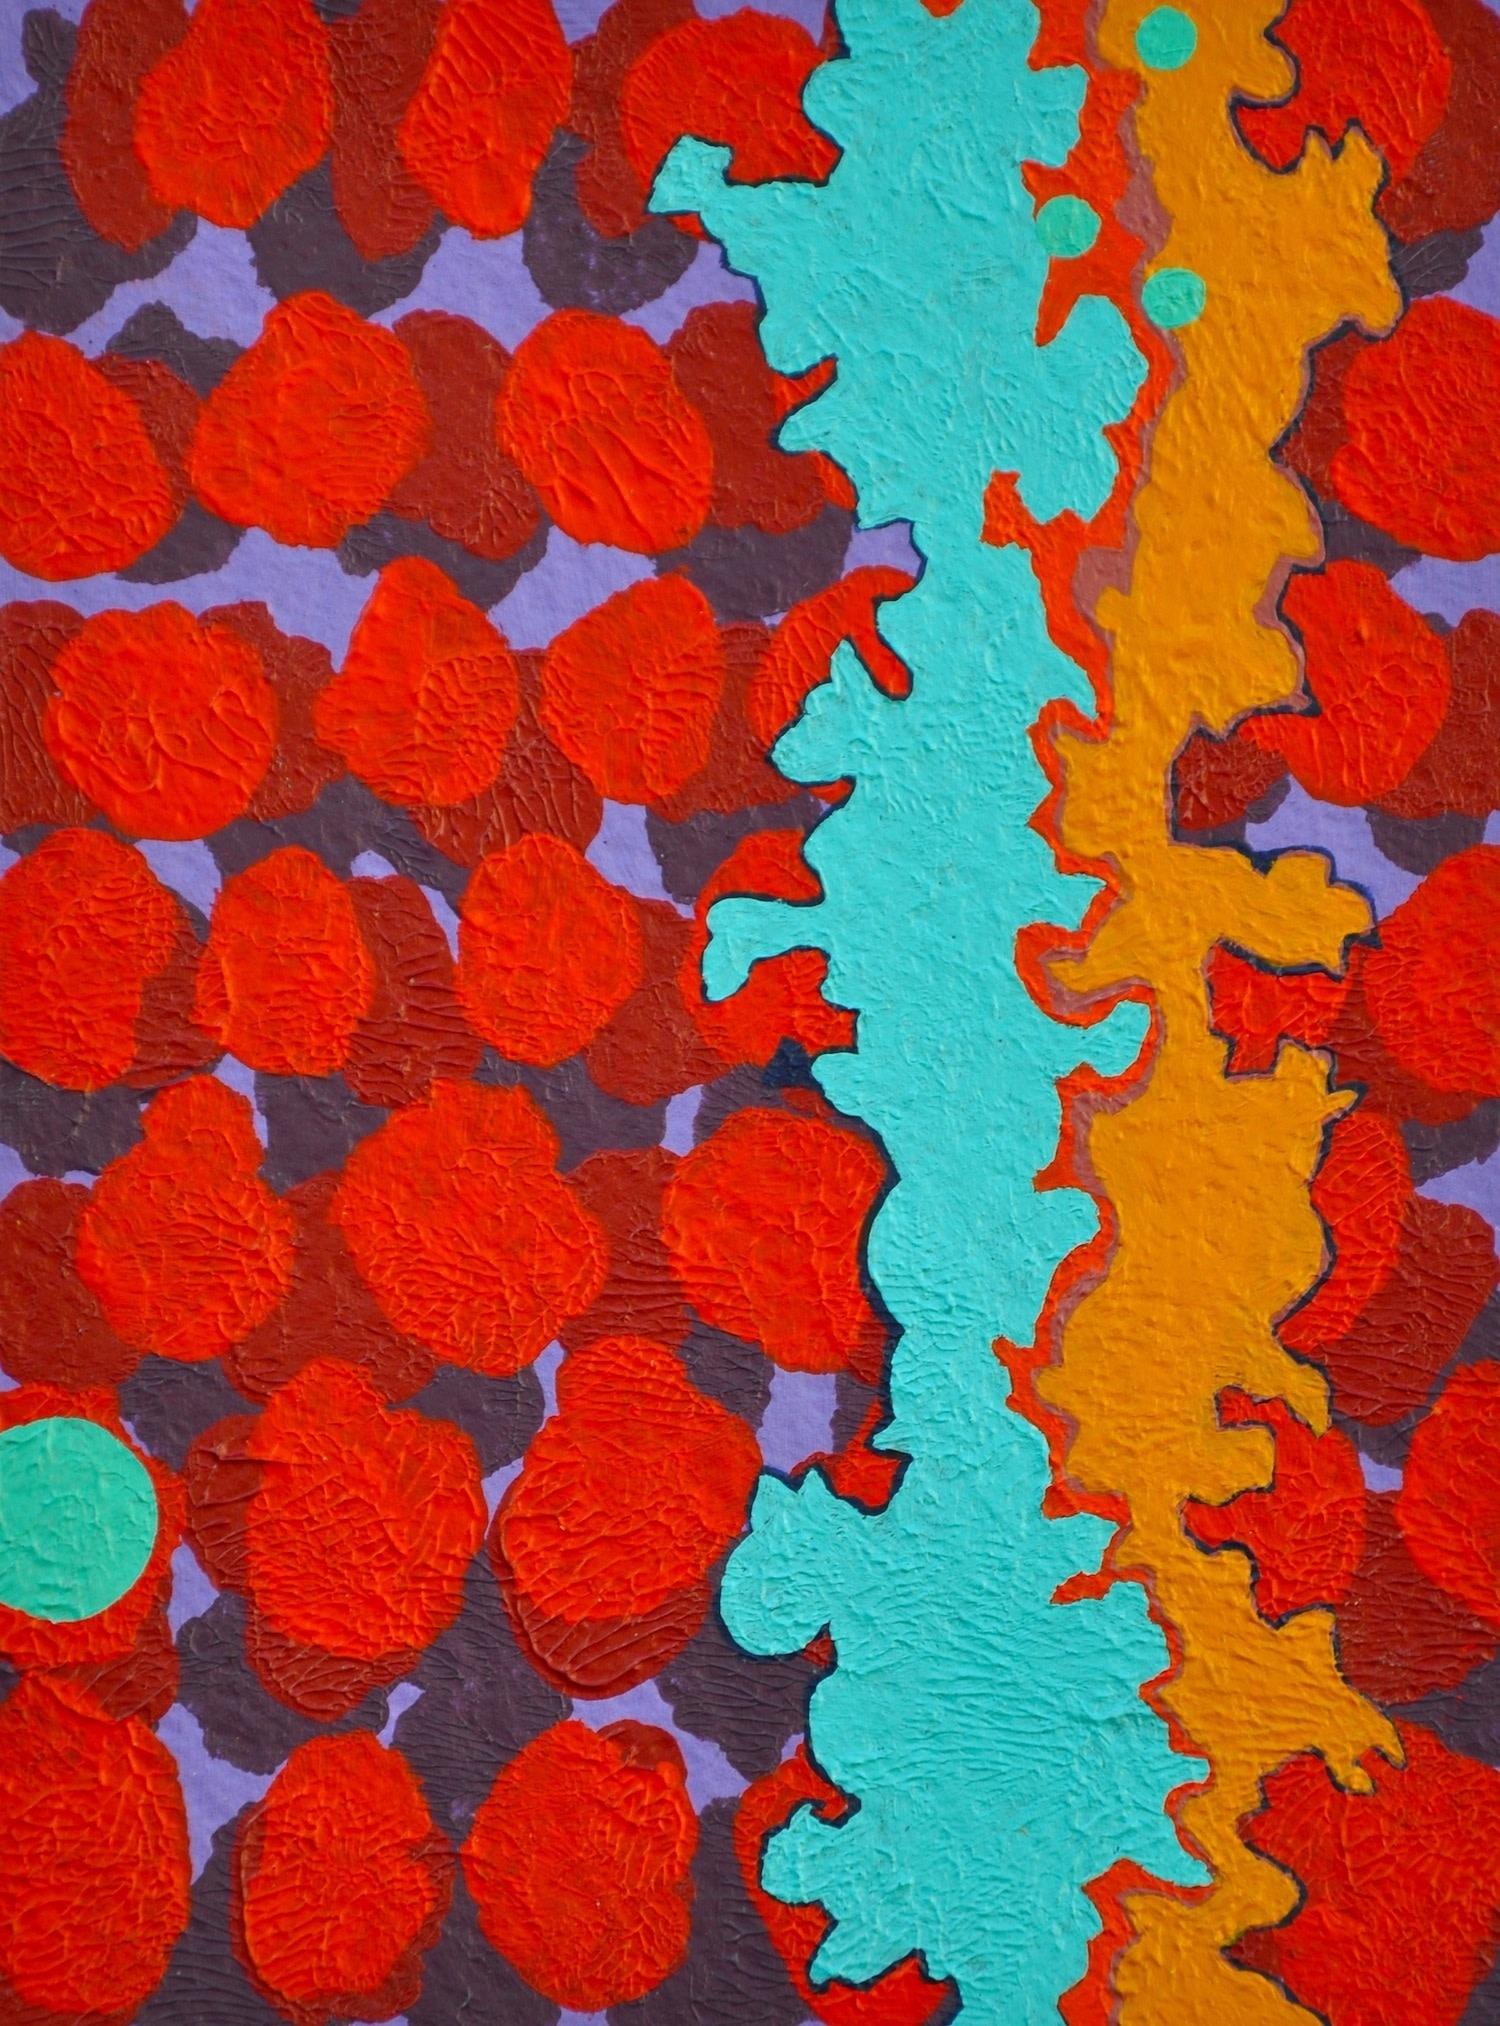 <span class=&#34;link fancybox-details-link&#34;><a href=&#34;/exhibitions/24/works/artworks_standalone10702/&#34;>View Detail Page</a></span><div class=&#34;artist&#34;><span class=&#34;artist&#34;><strong>John Crossley</strong></span></div><div class=&#34;title&#34;><em>Totem</em></div><div class=&#34;medium&#34;>acrylic</div><div class=&#34;dimensions&#34;>29 x 24cm</div>